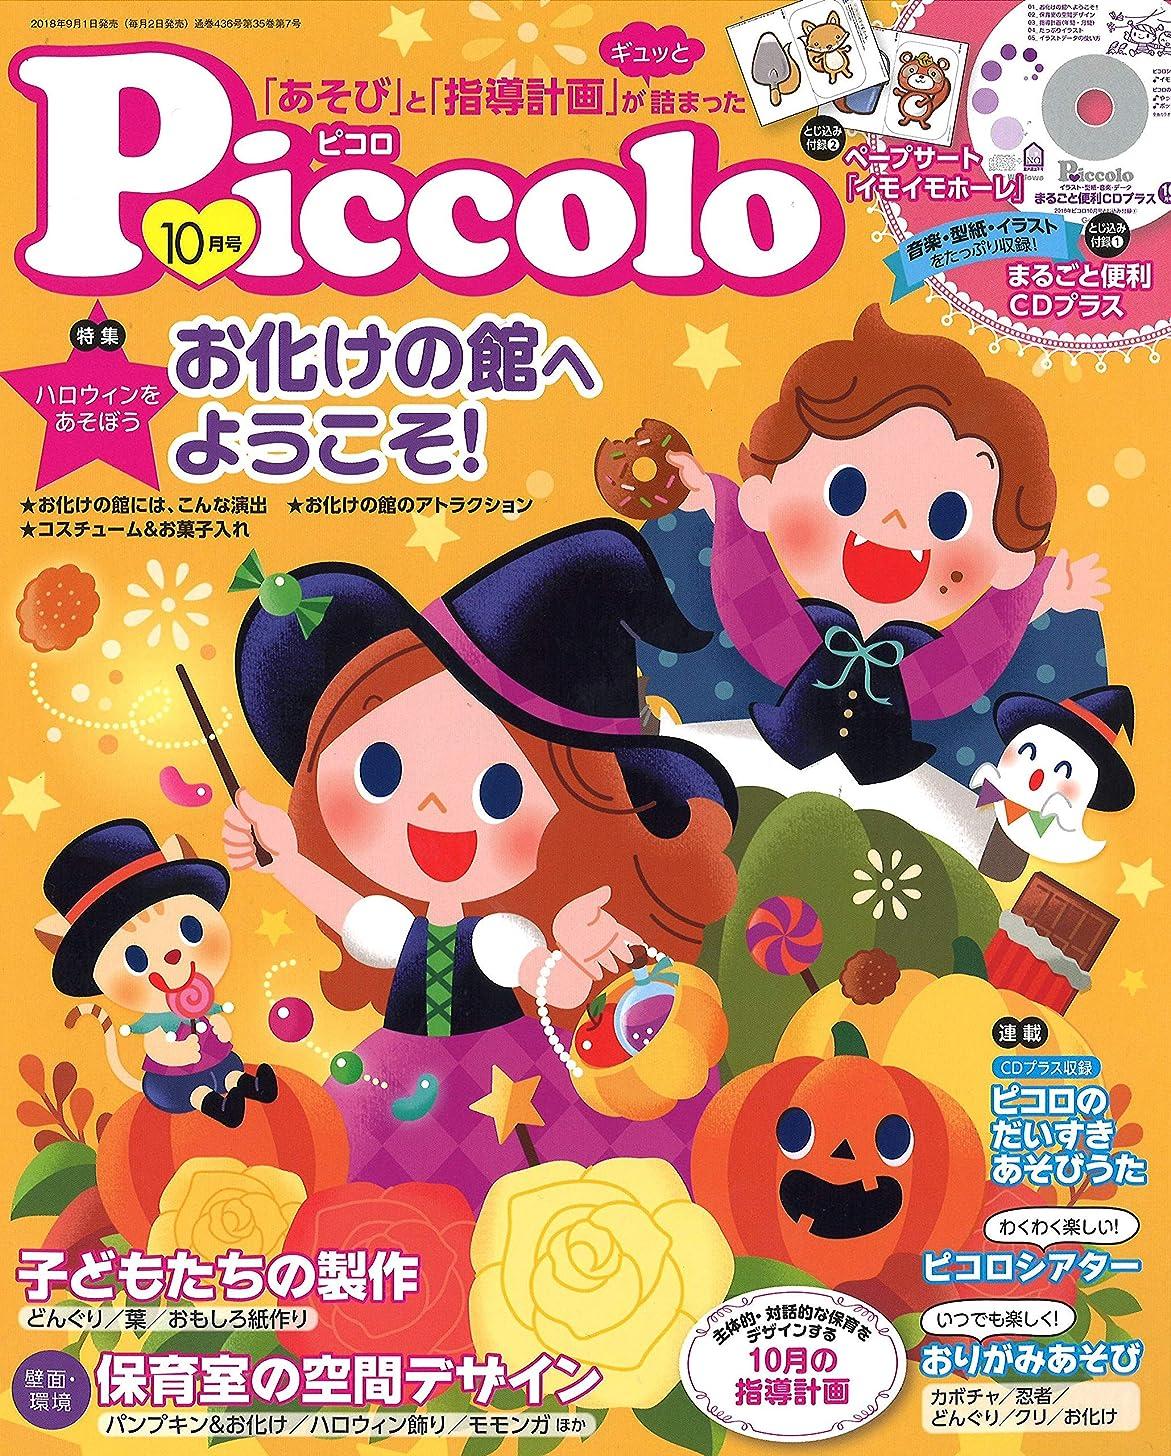 Japanese Magazine Piccolo (Piccolo) 2018 October issue [magazine]